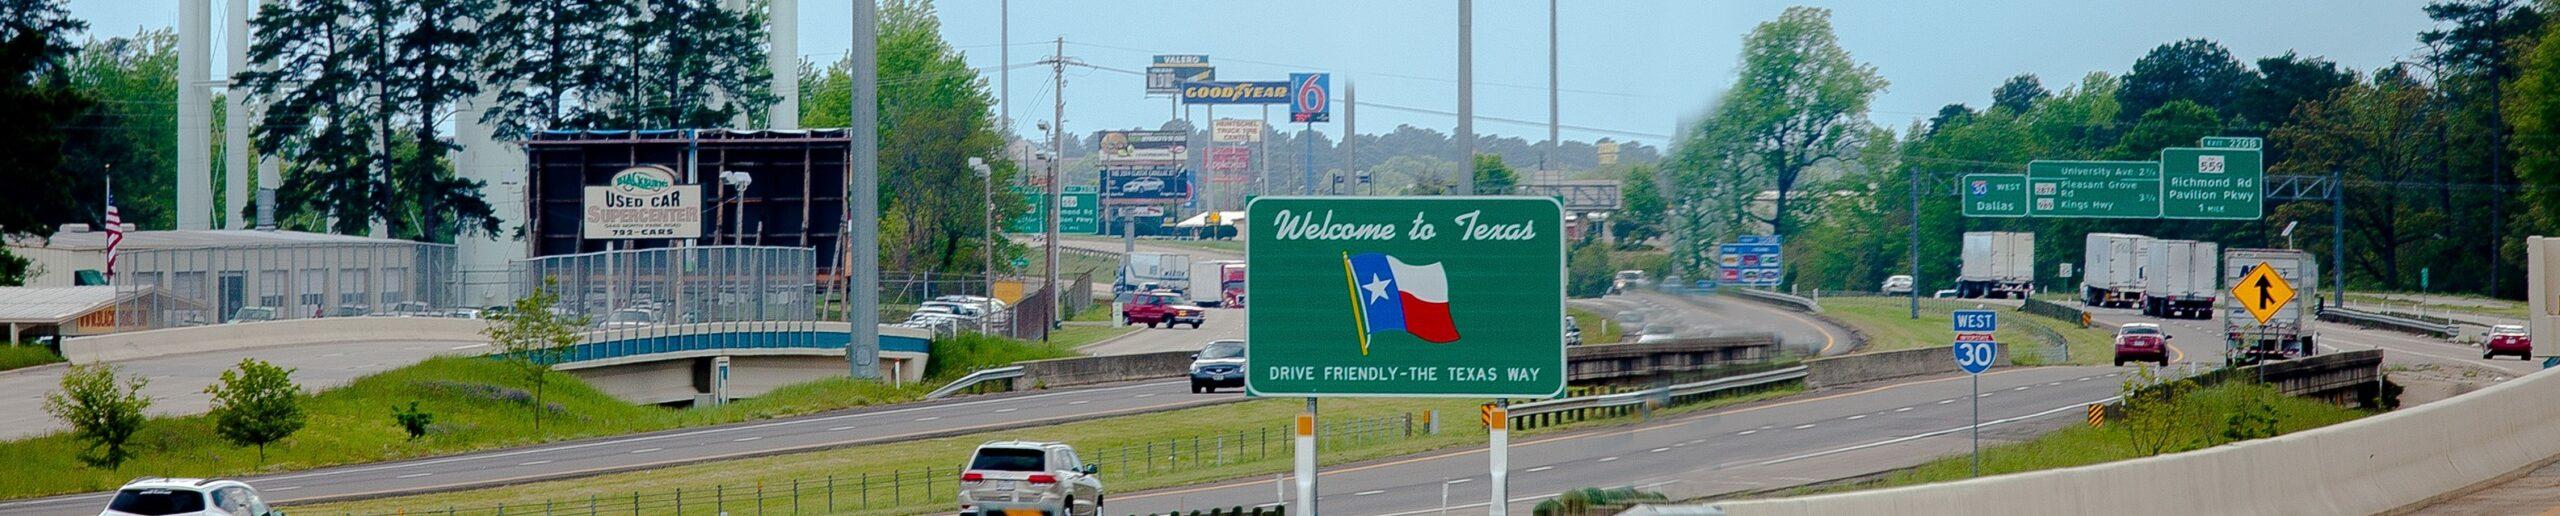 Texarkana, TX